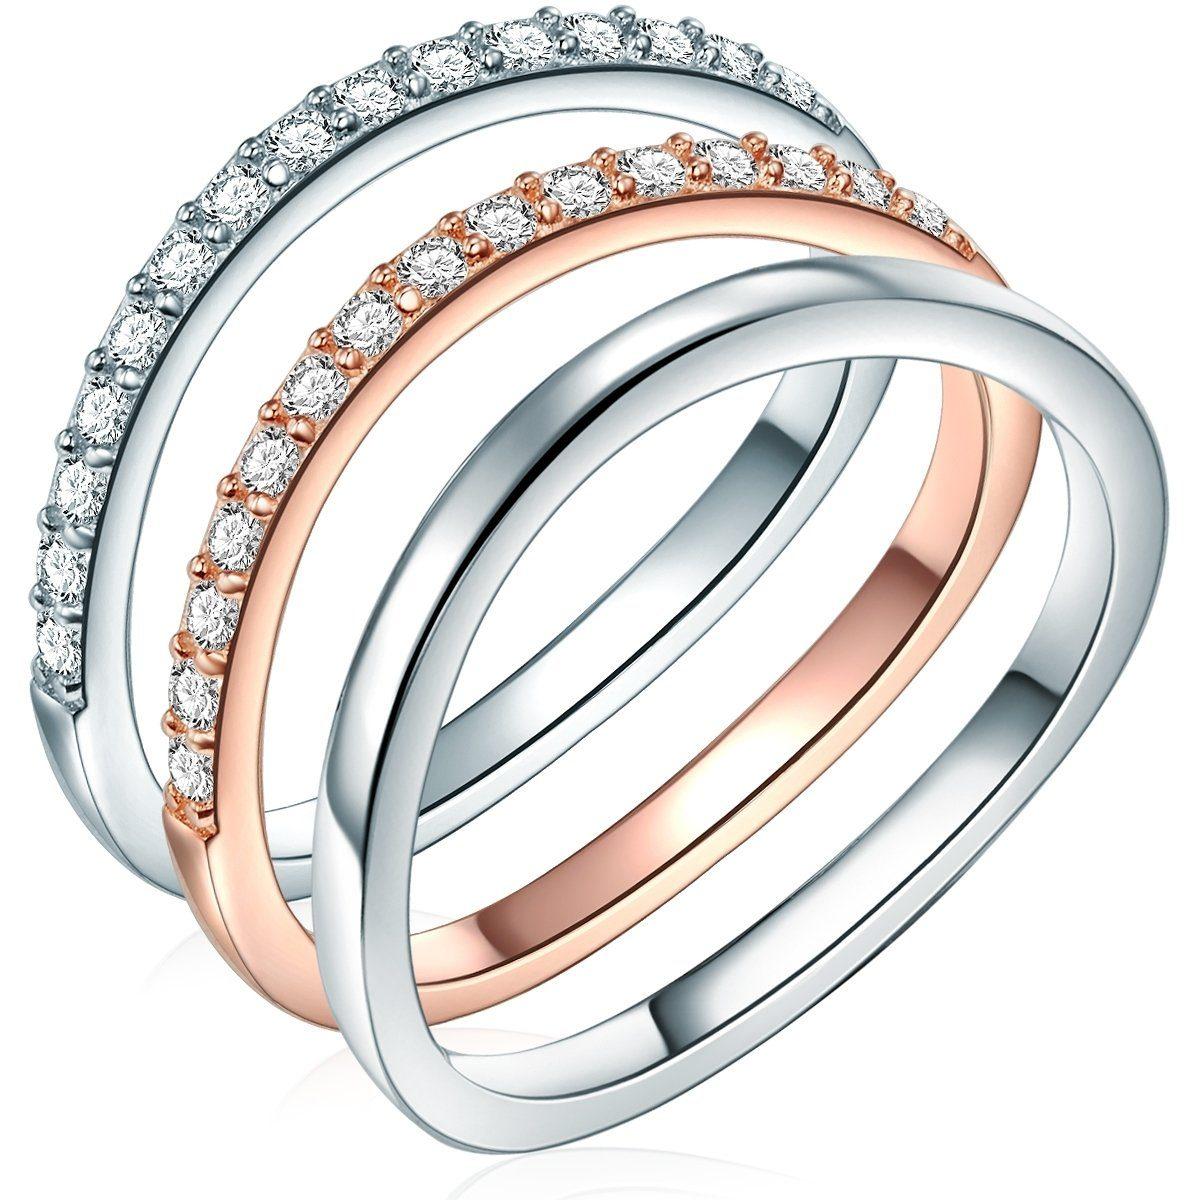 Rafaela Donata Fingerring ST134 | Schmuck > Ringe > Fingerringe | Rafaela Donata